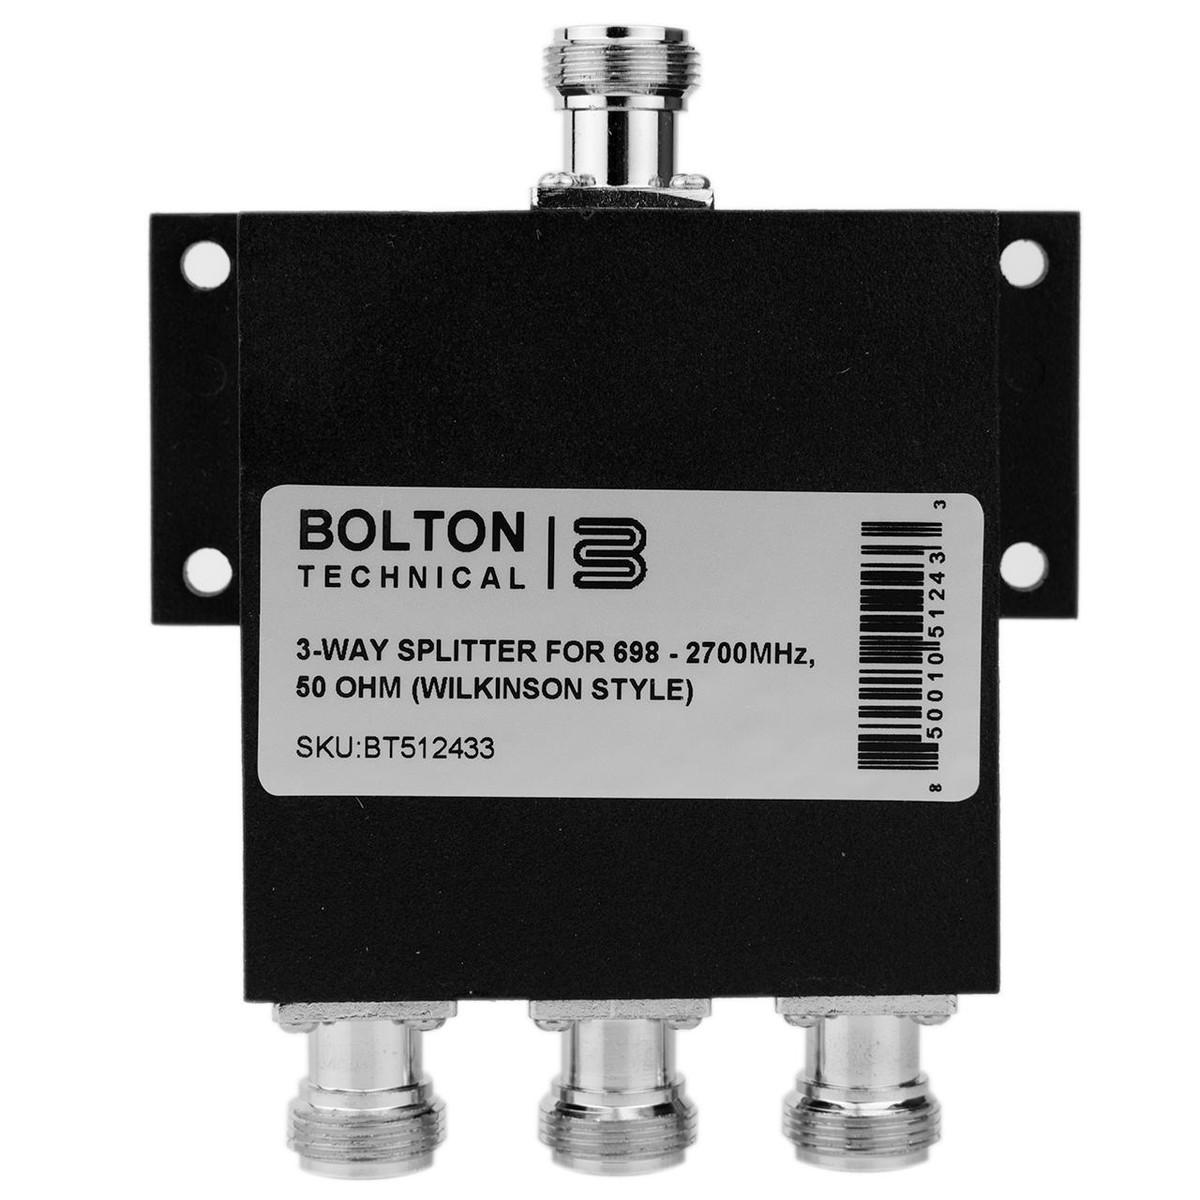 Bolton Tech Bolton Technical Low-PIM 3-Way Splitter 698-2700Mhz 50 Ohm Wilkinson Style